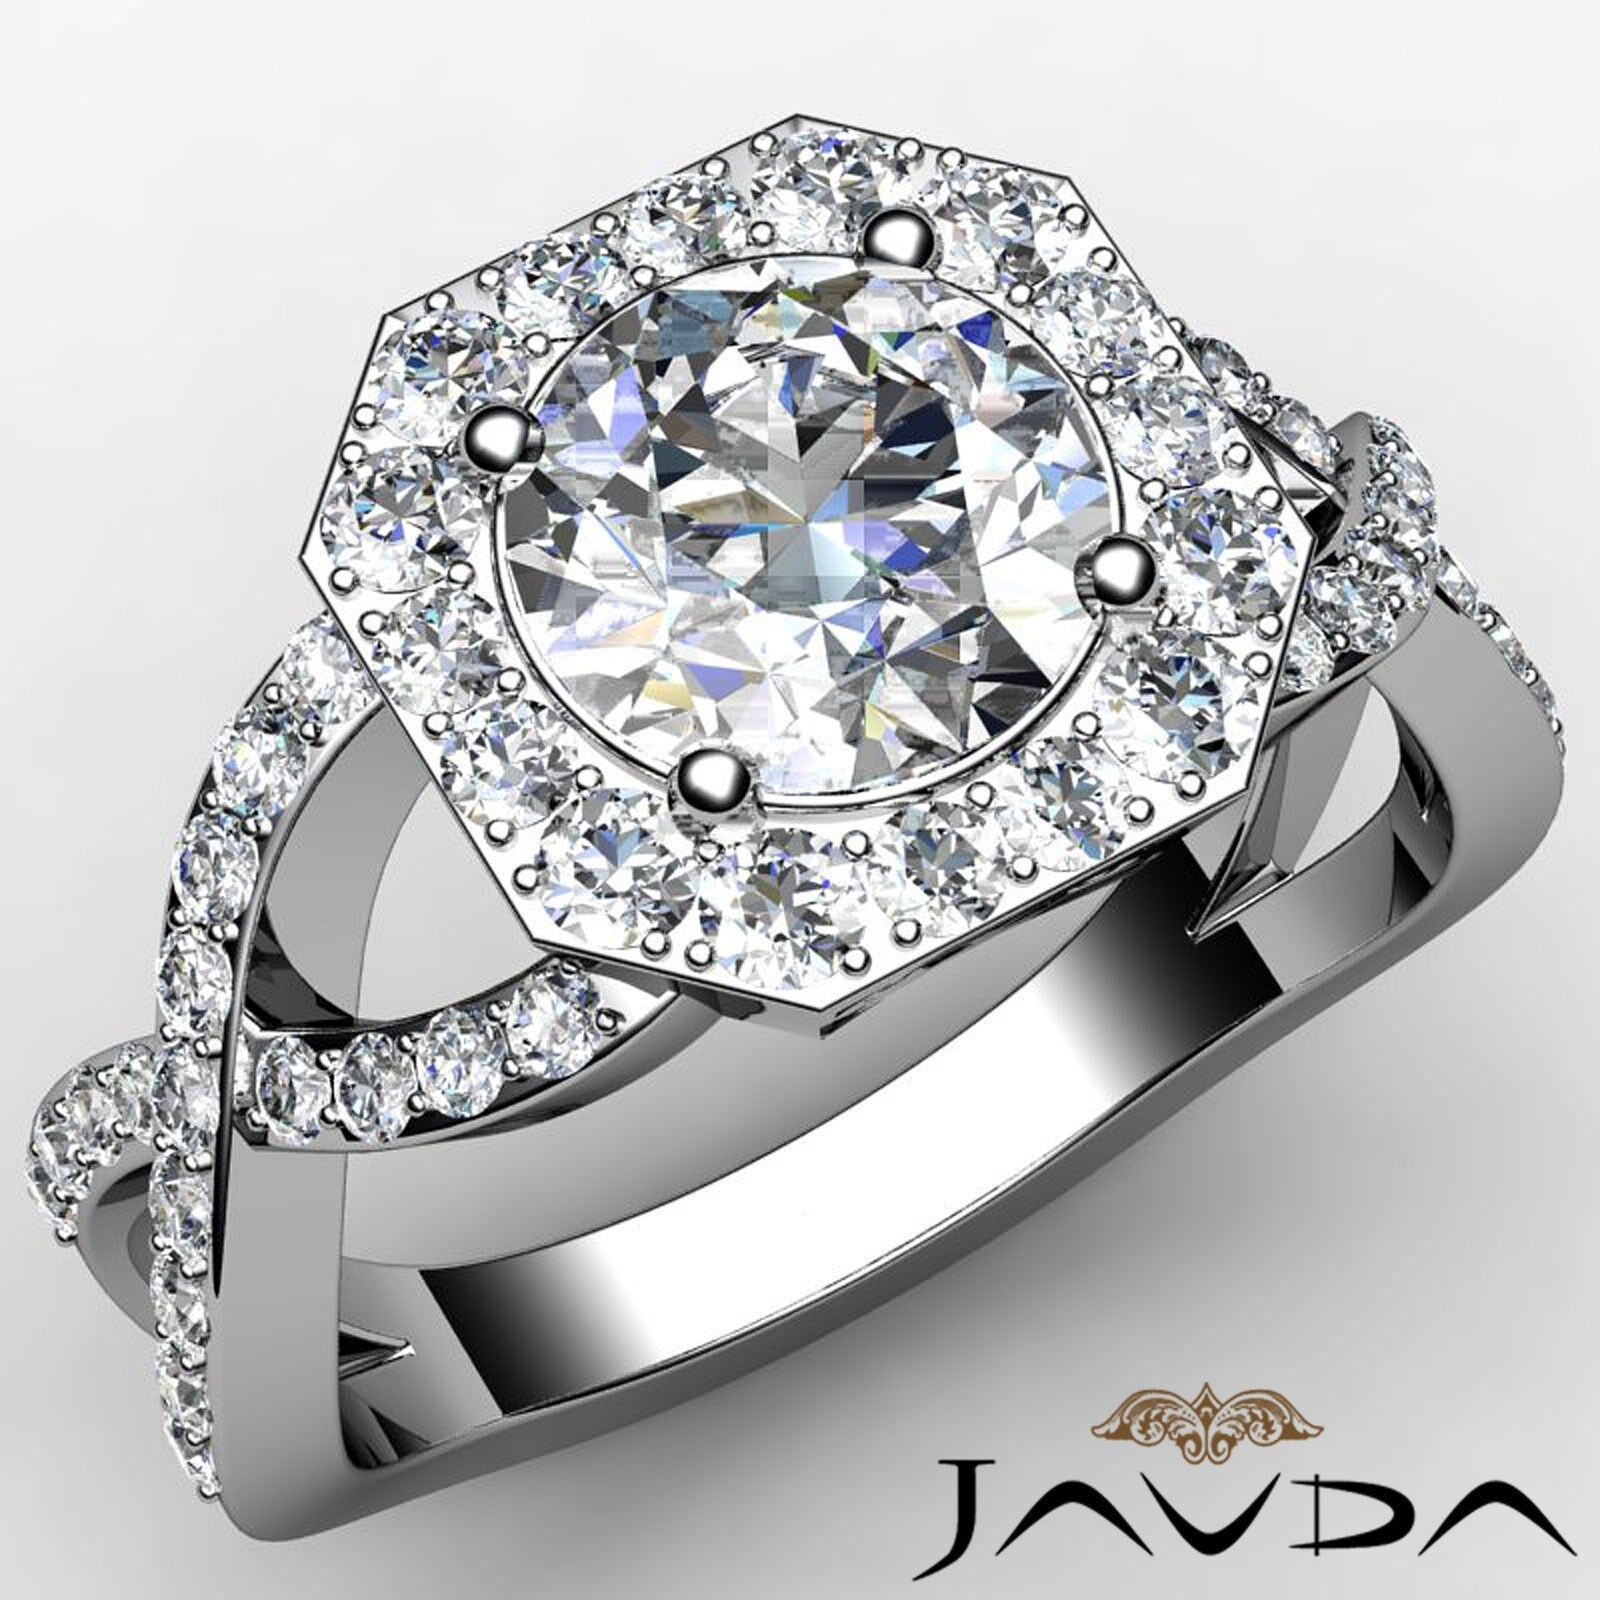 Hexagon Style Halo Round Diamond Engagement Cross Shank Ring GIA F VS1 2.13 Ct